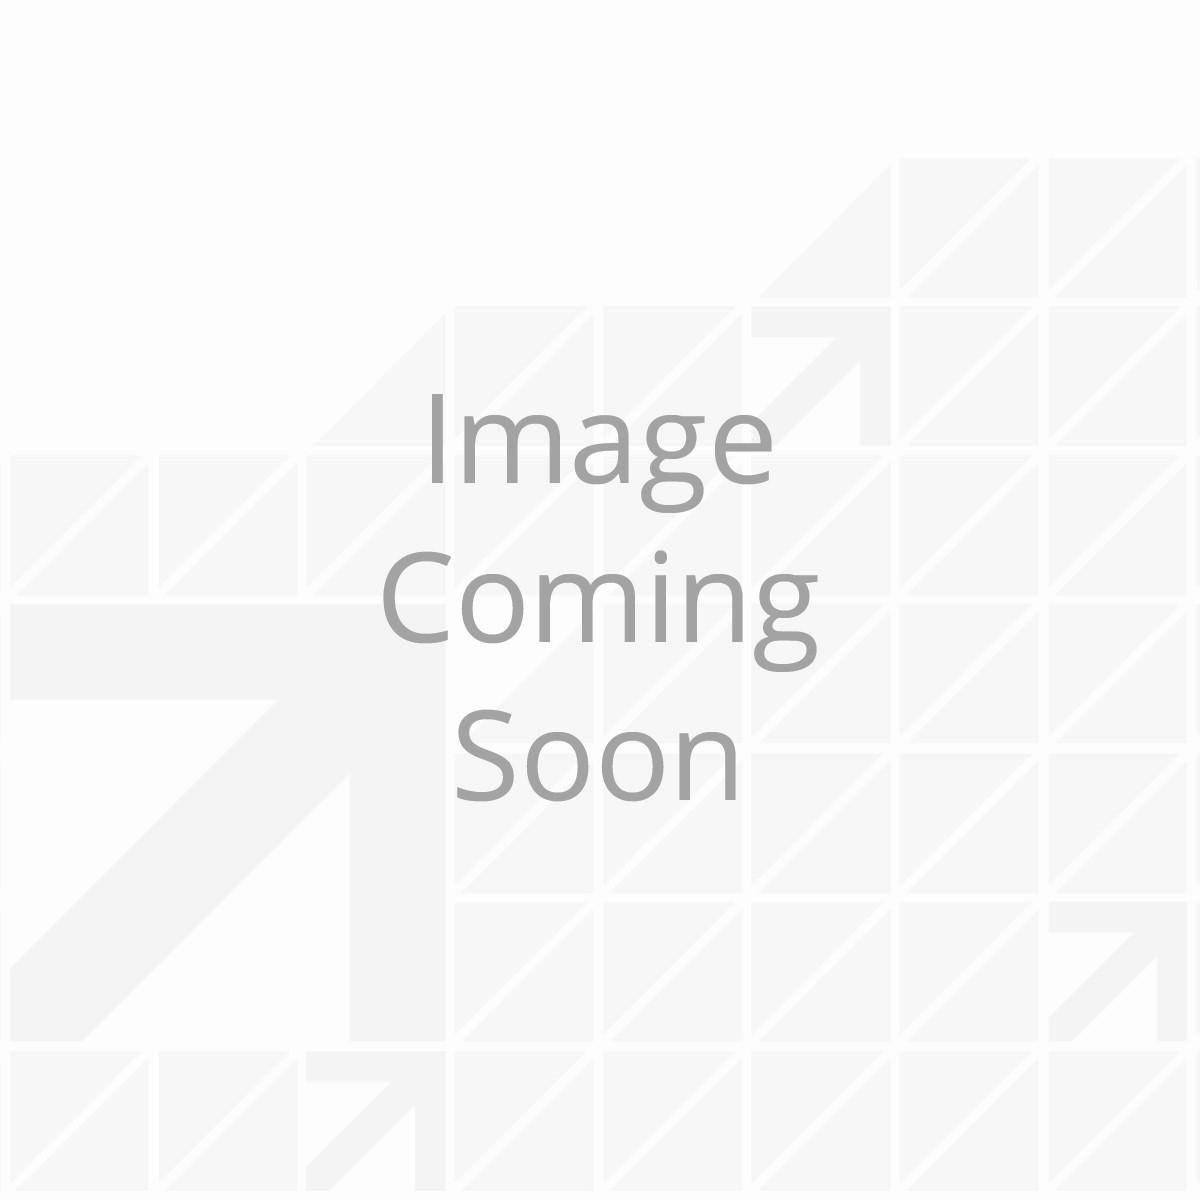 1.5 cu.ft OTR Convection Microwave Oven, Black (FMCM15-BL)